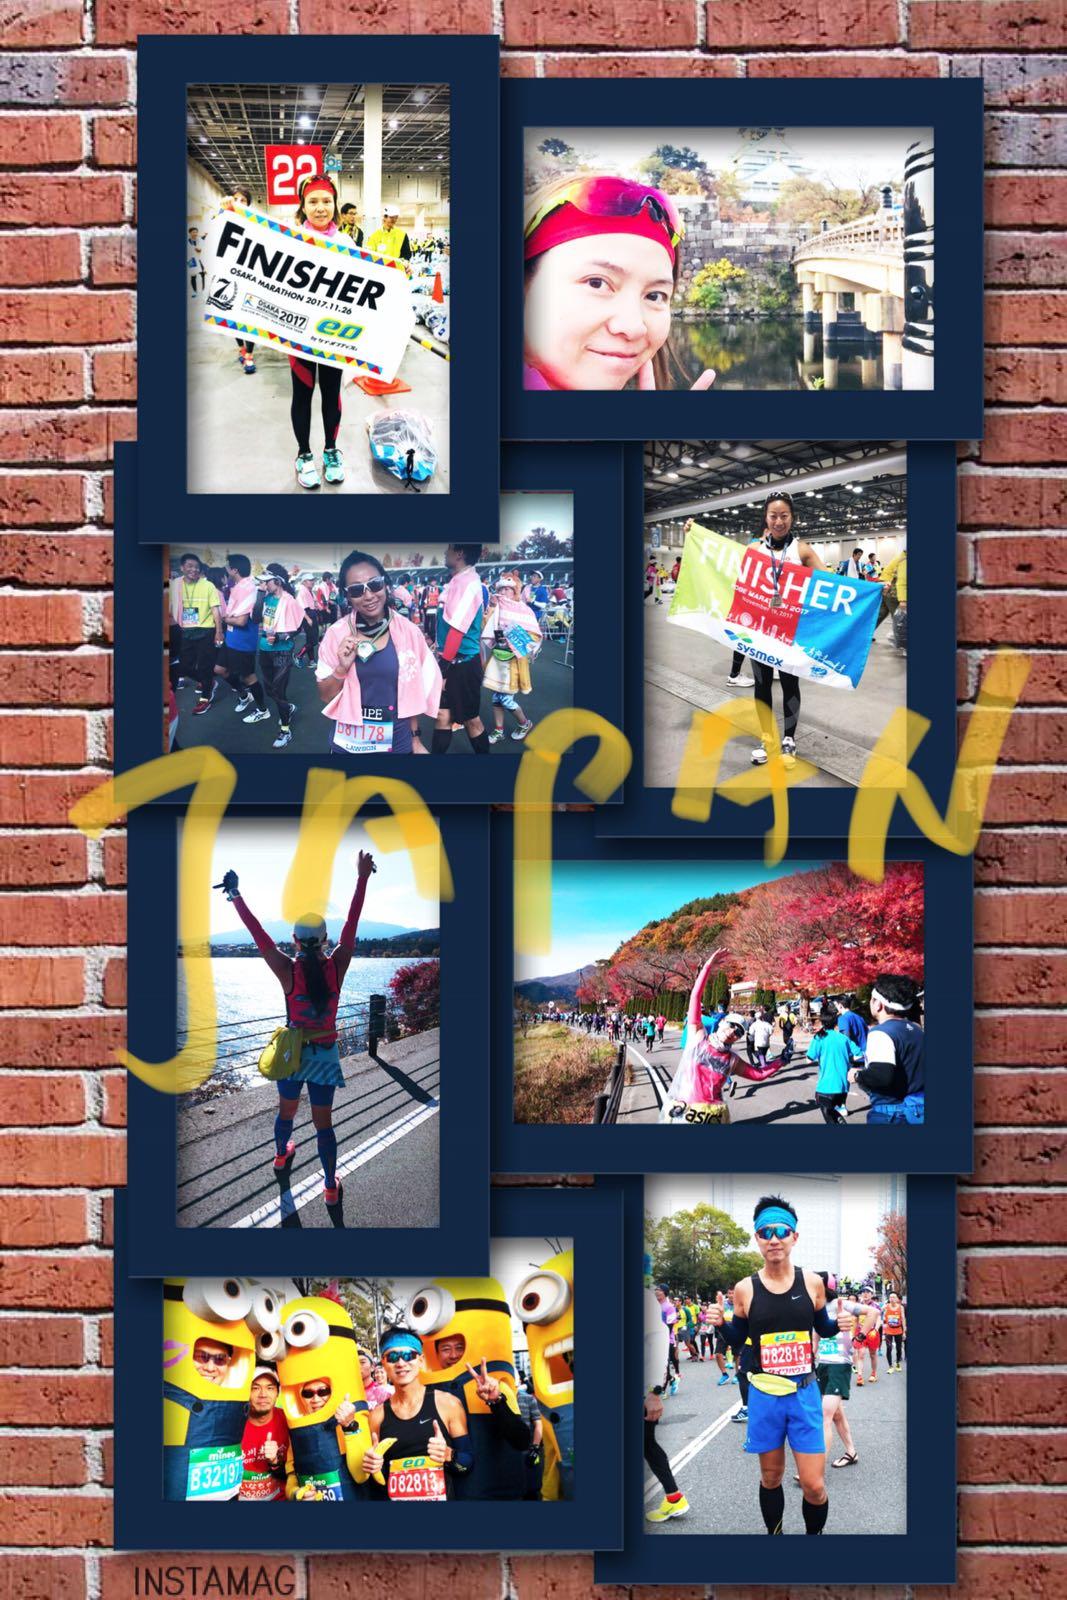 2017-12-05-PHOTO-00007153.jpg